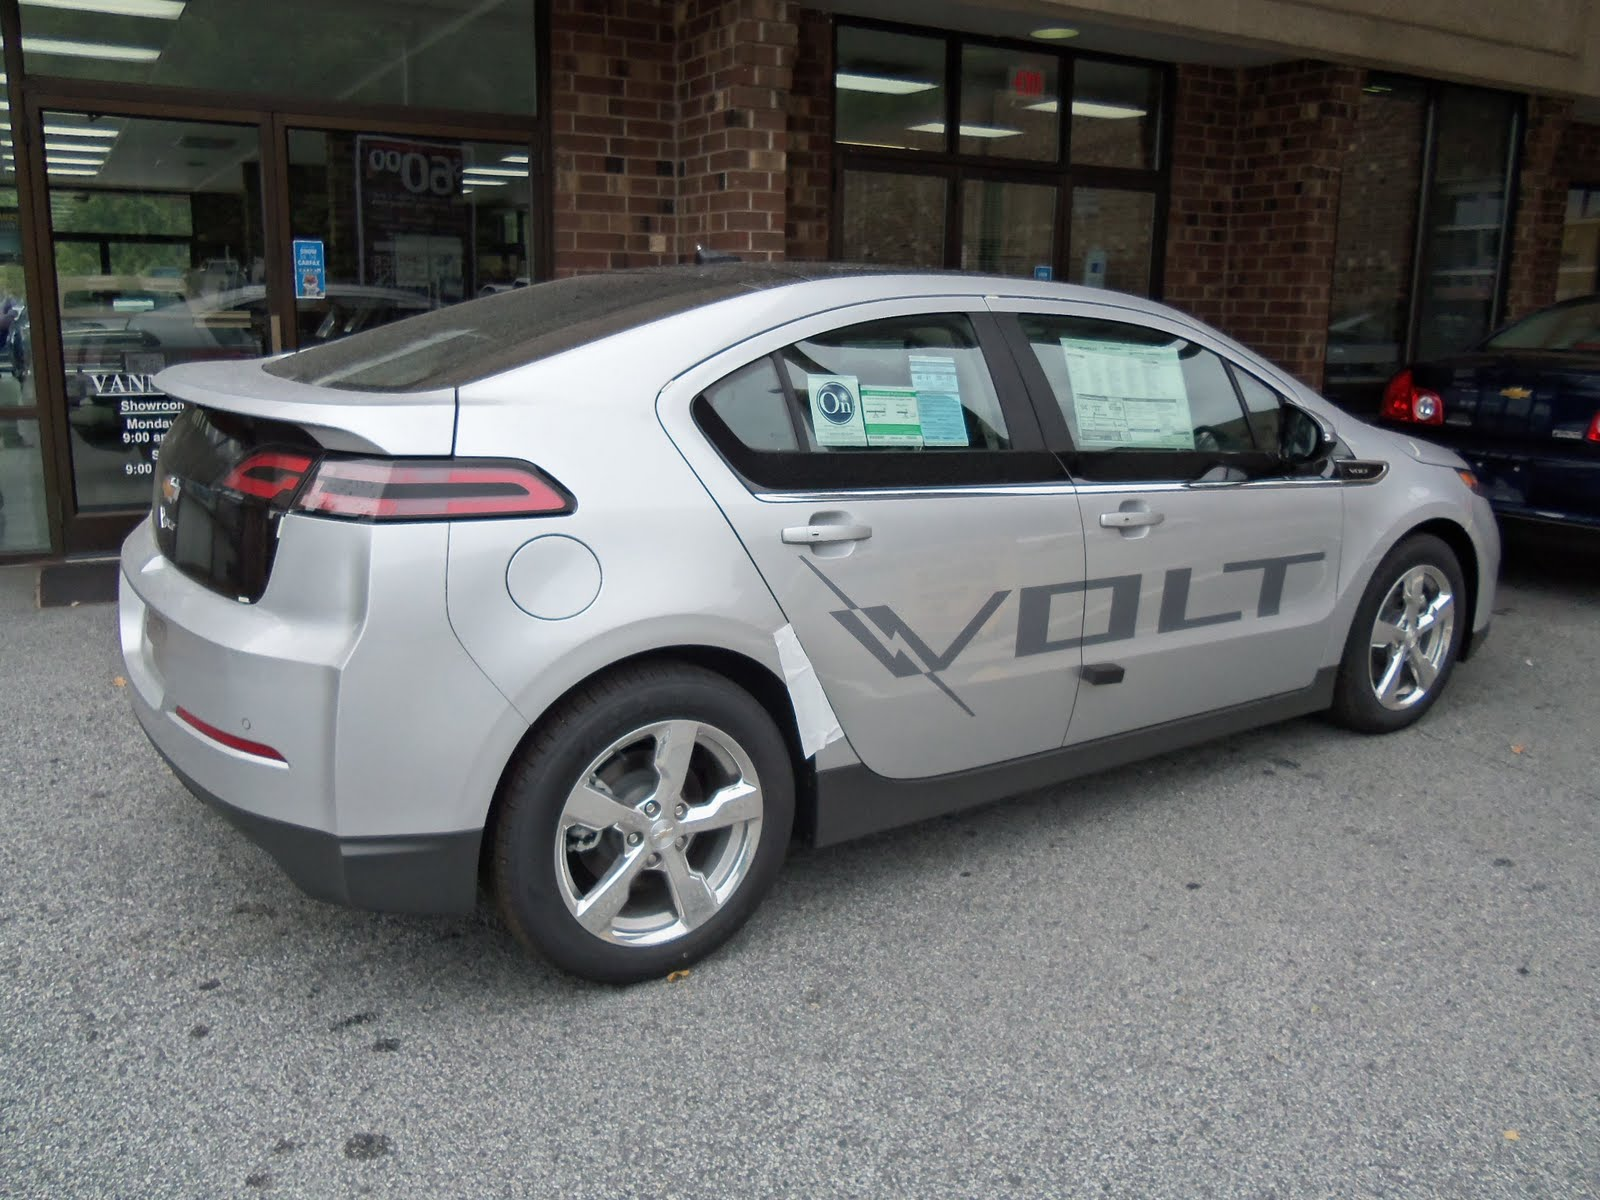 Vann York Chevy >> Vann York Chevrolet Buick Gmc Cadillac Check Out This All .html | Autos Weblog